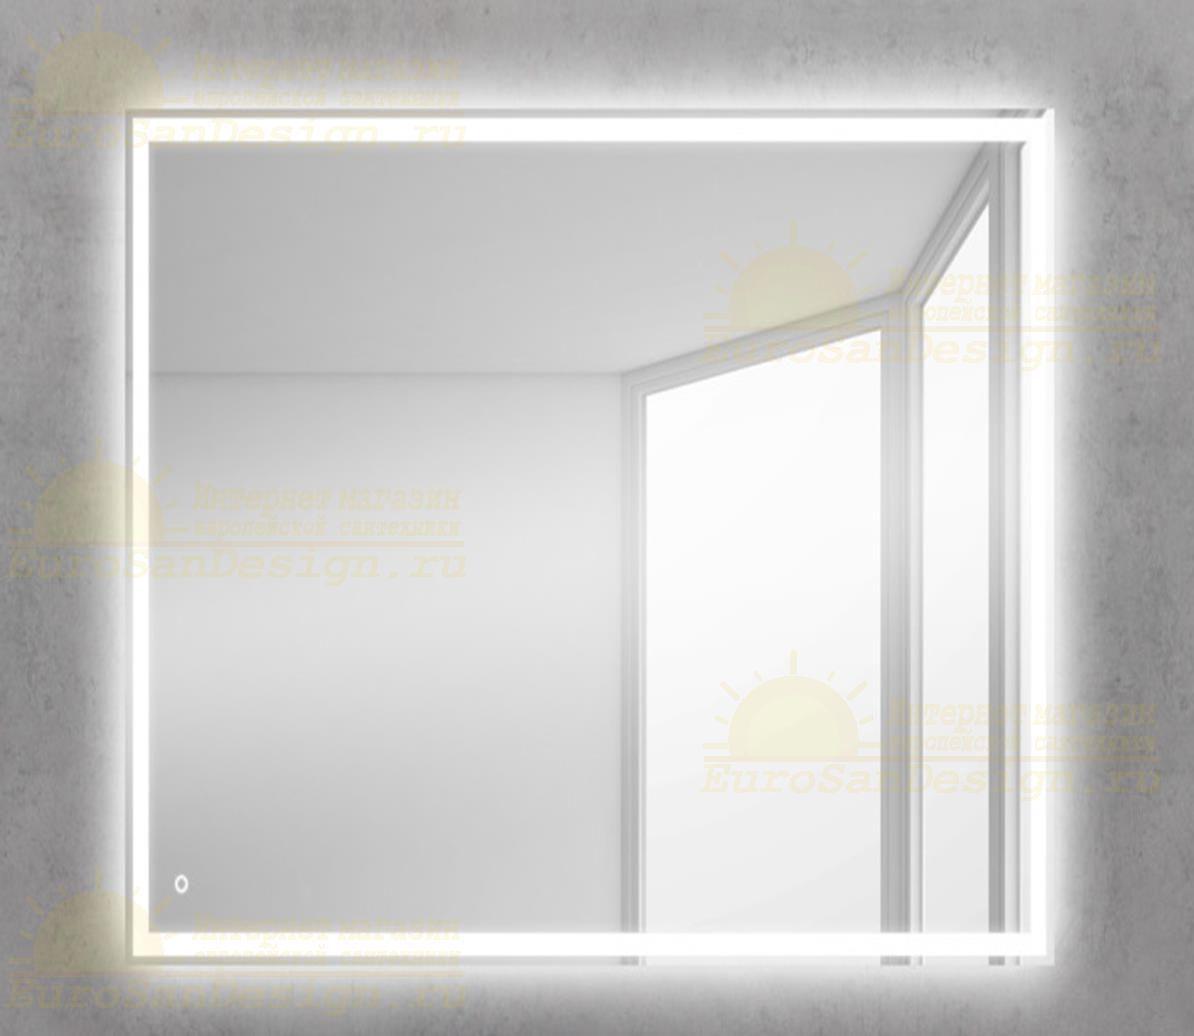 Зеркало для ванной комнаты BelBagno SPC-GRT-600-600-LED-TCH ФОТО